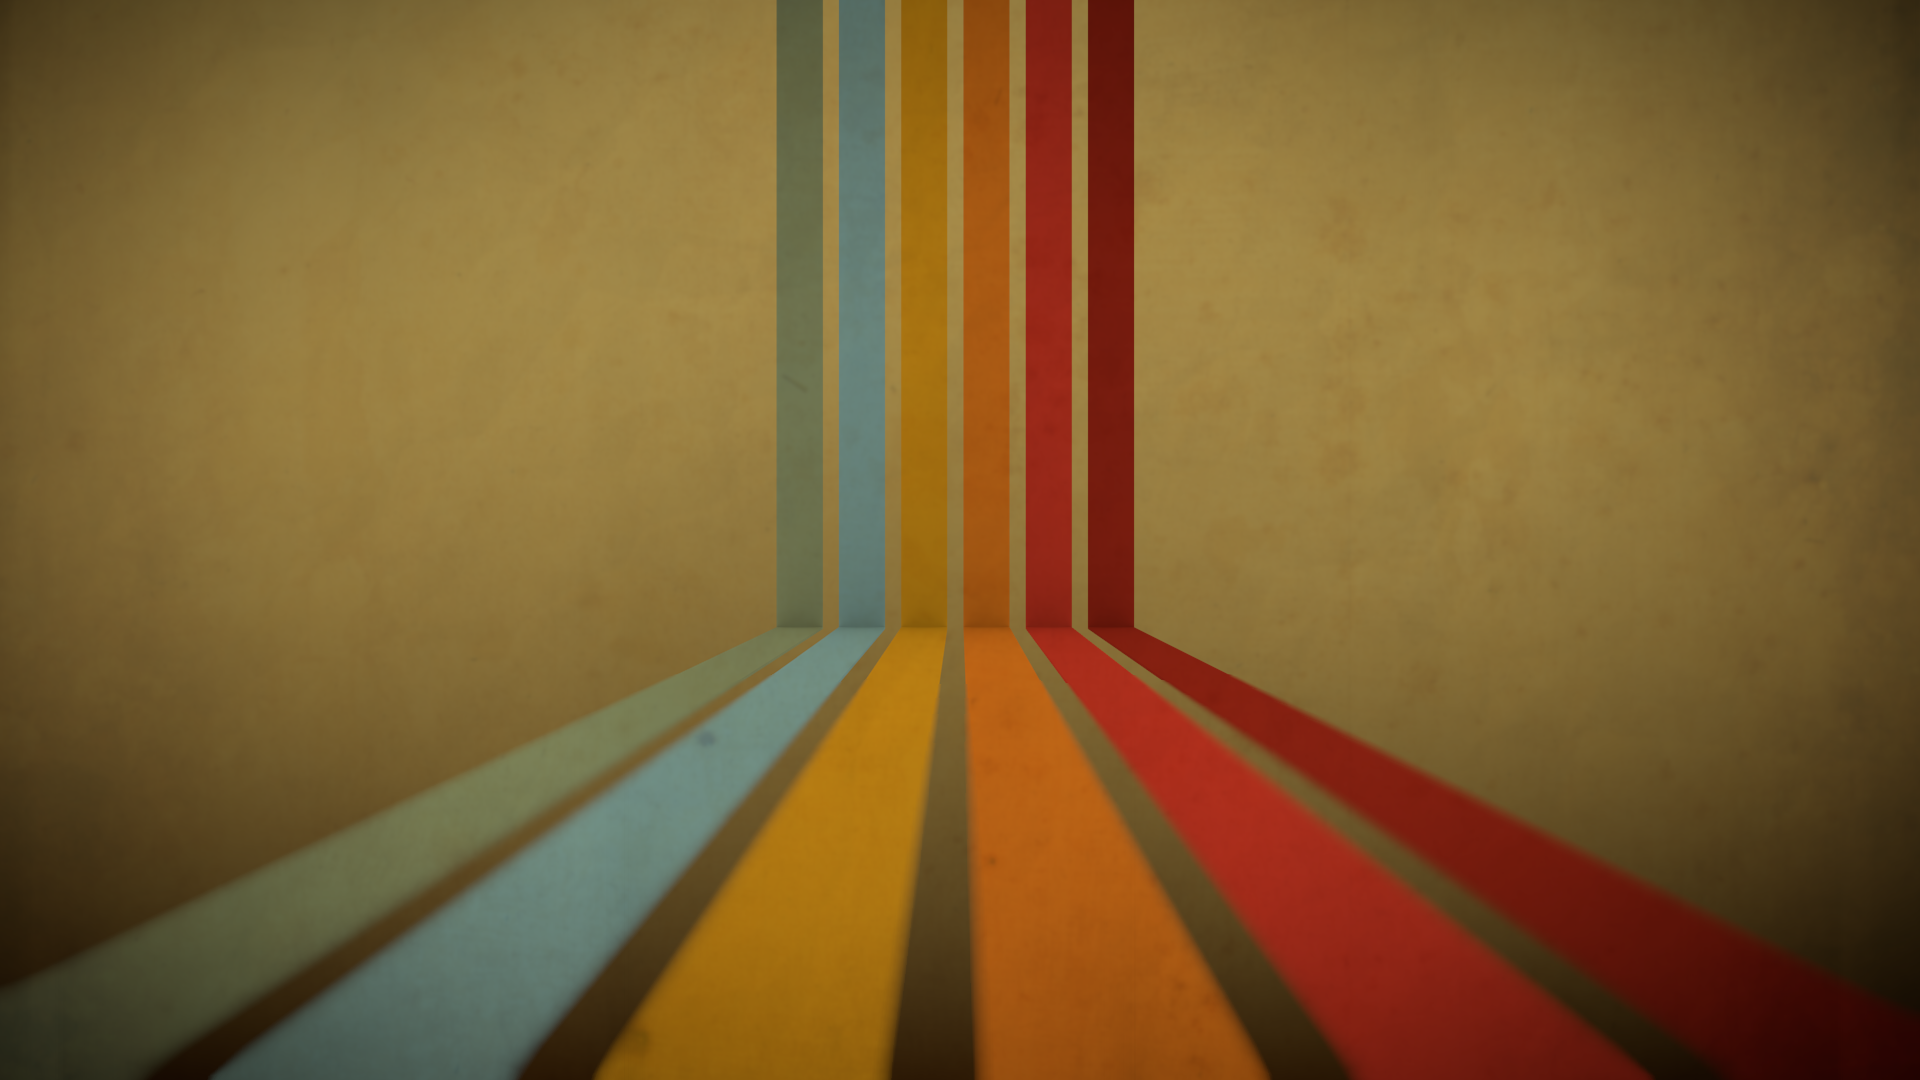 Retro Wallpaper by x11kjm 1920x1080